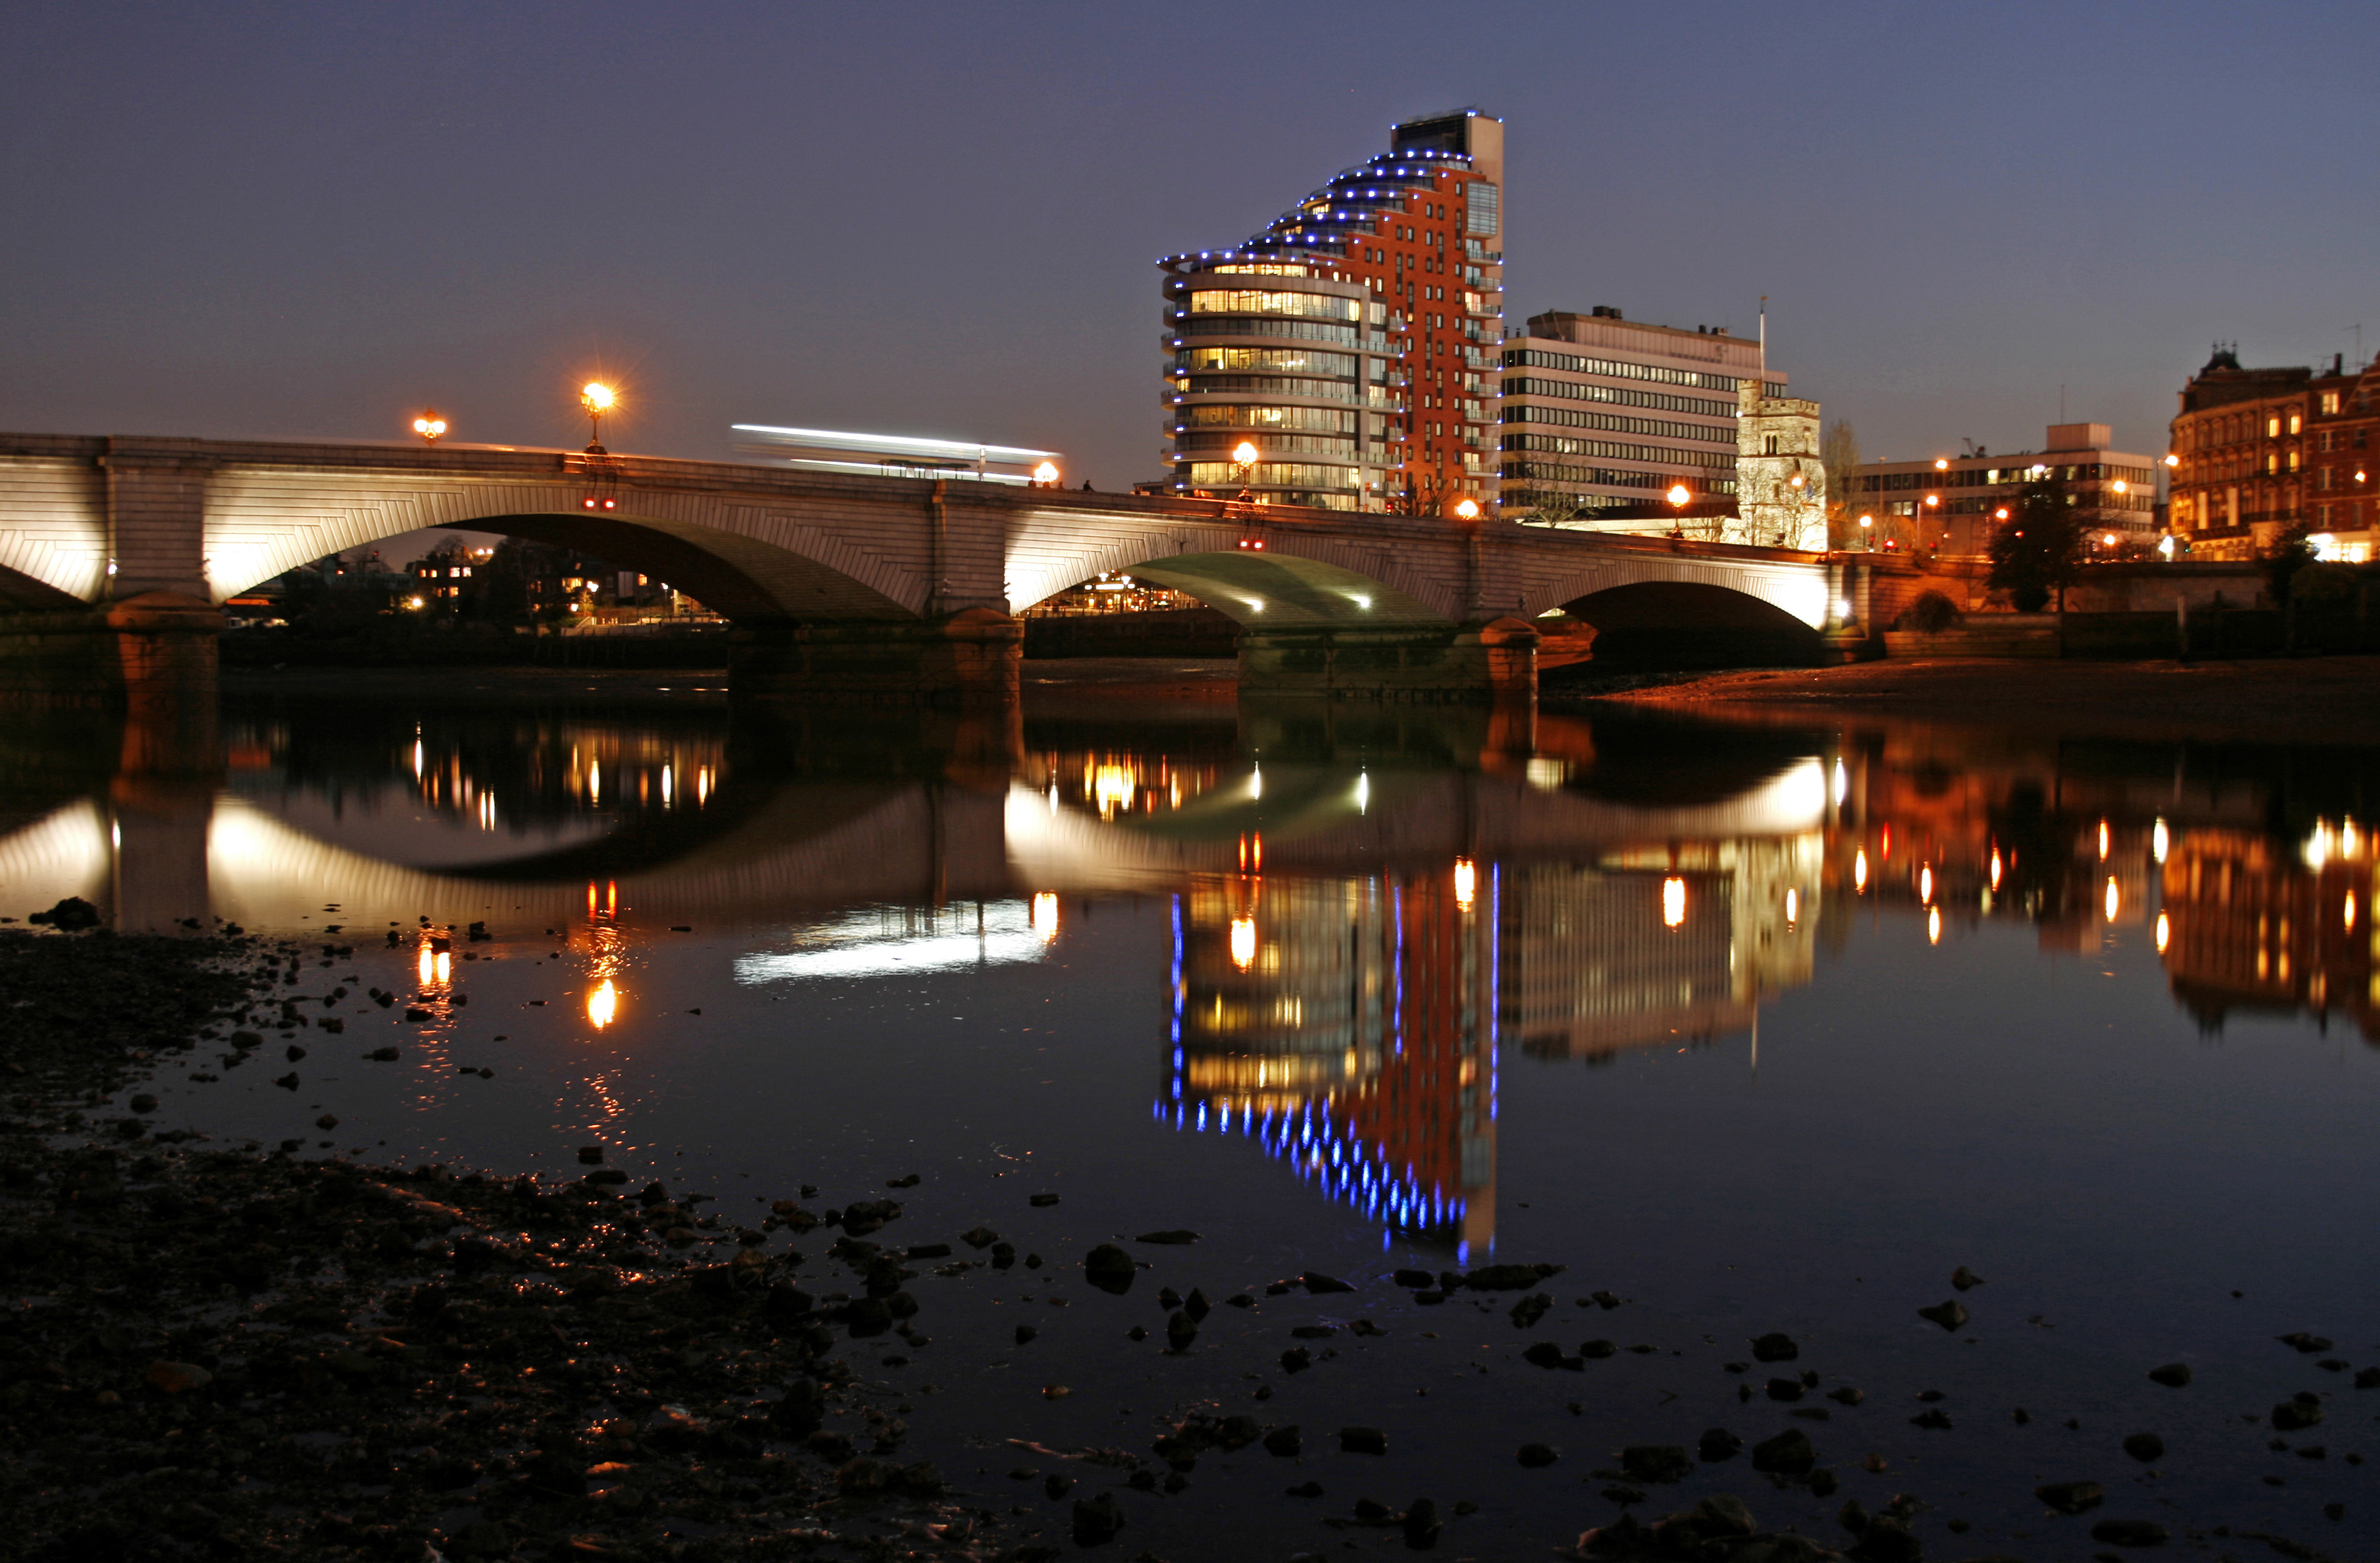 England, London, Putney. View of Putney Bridge.